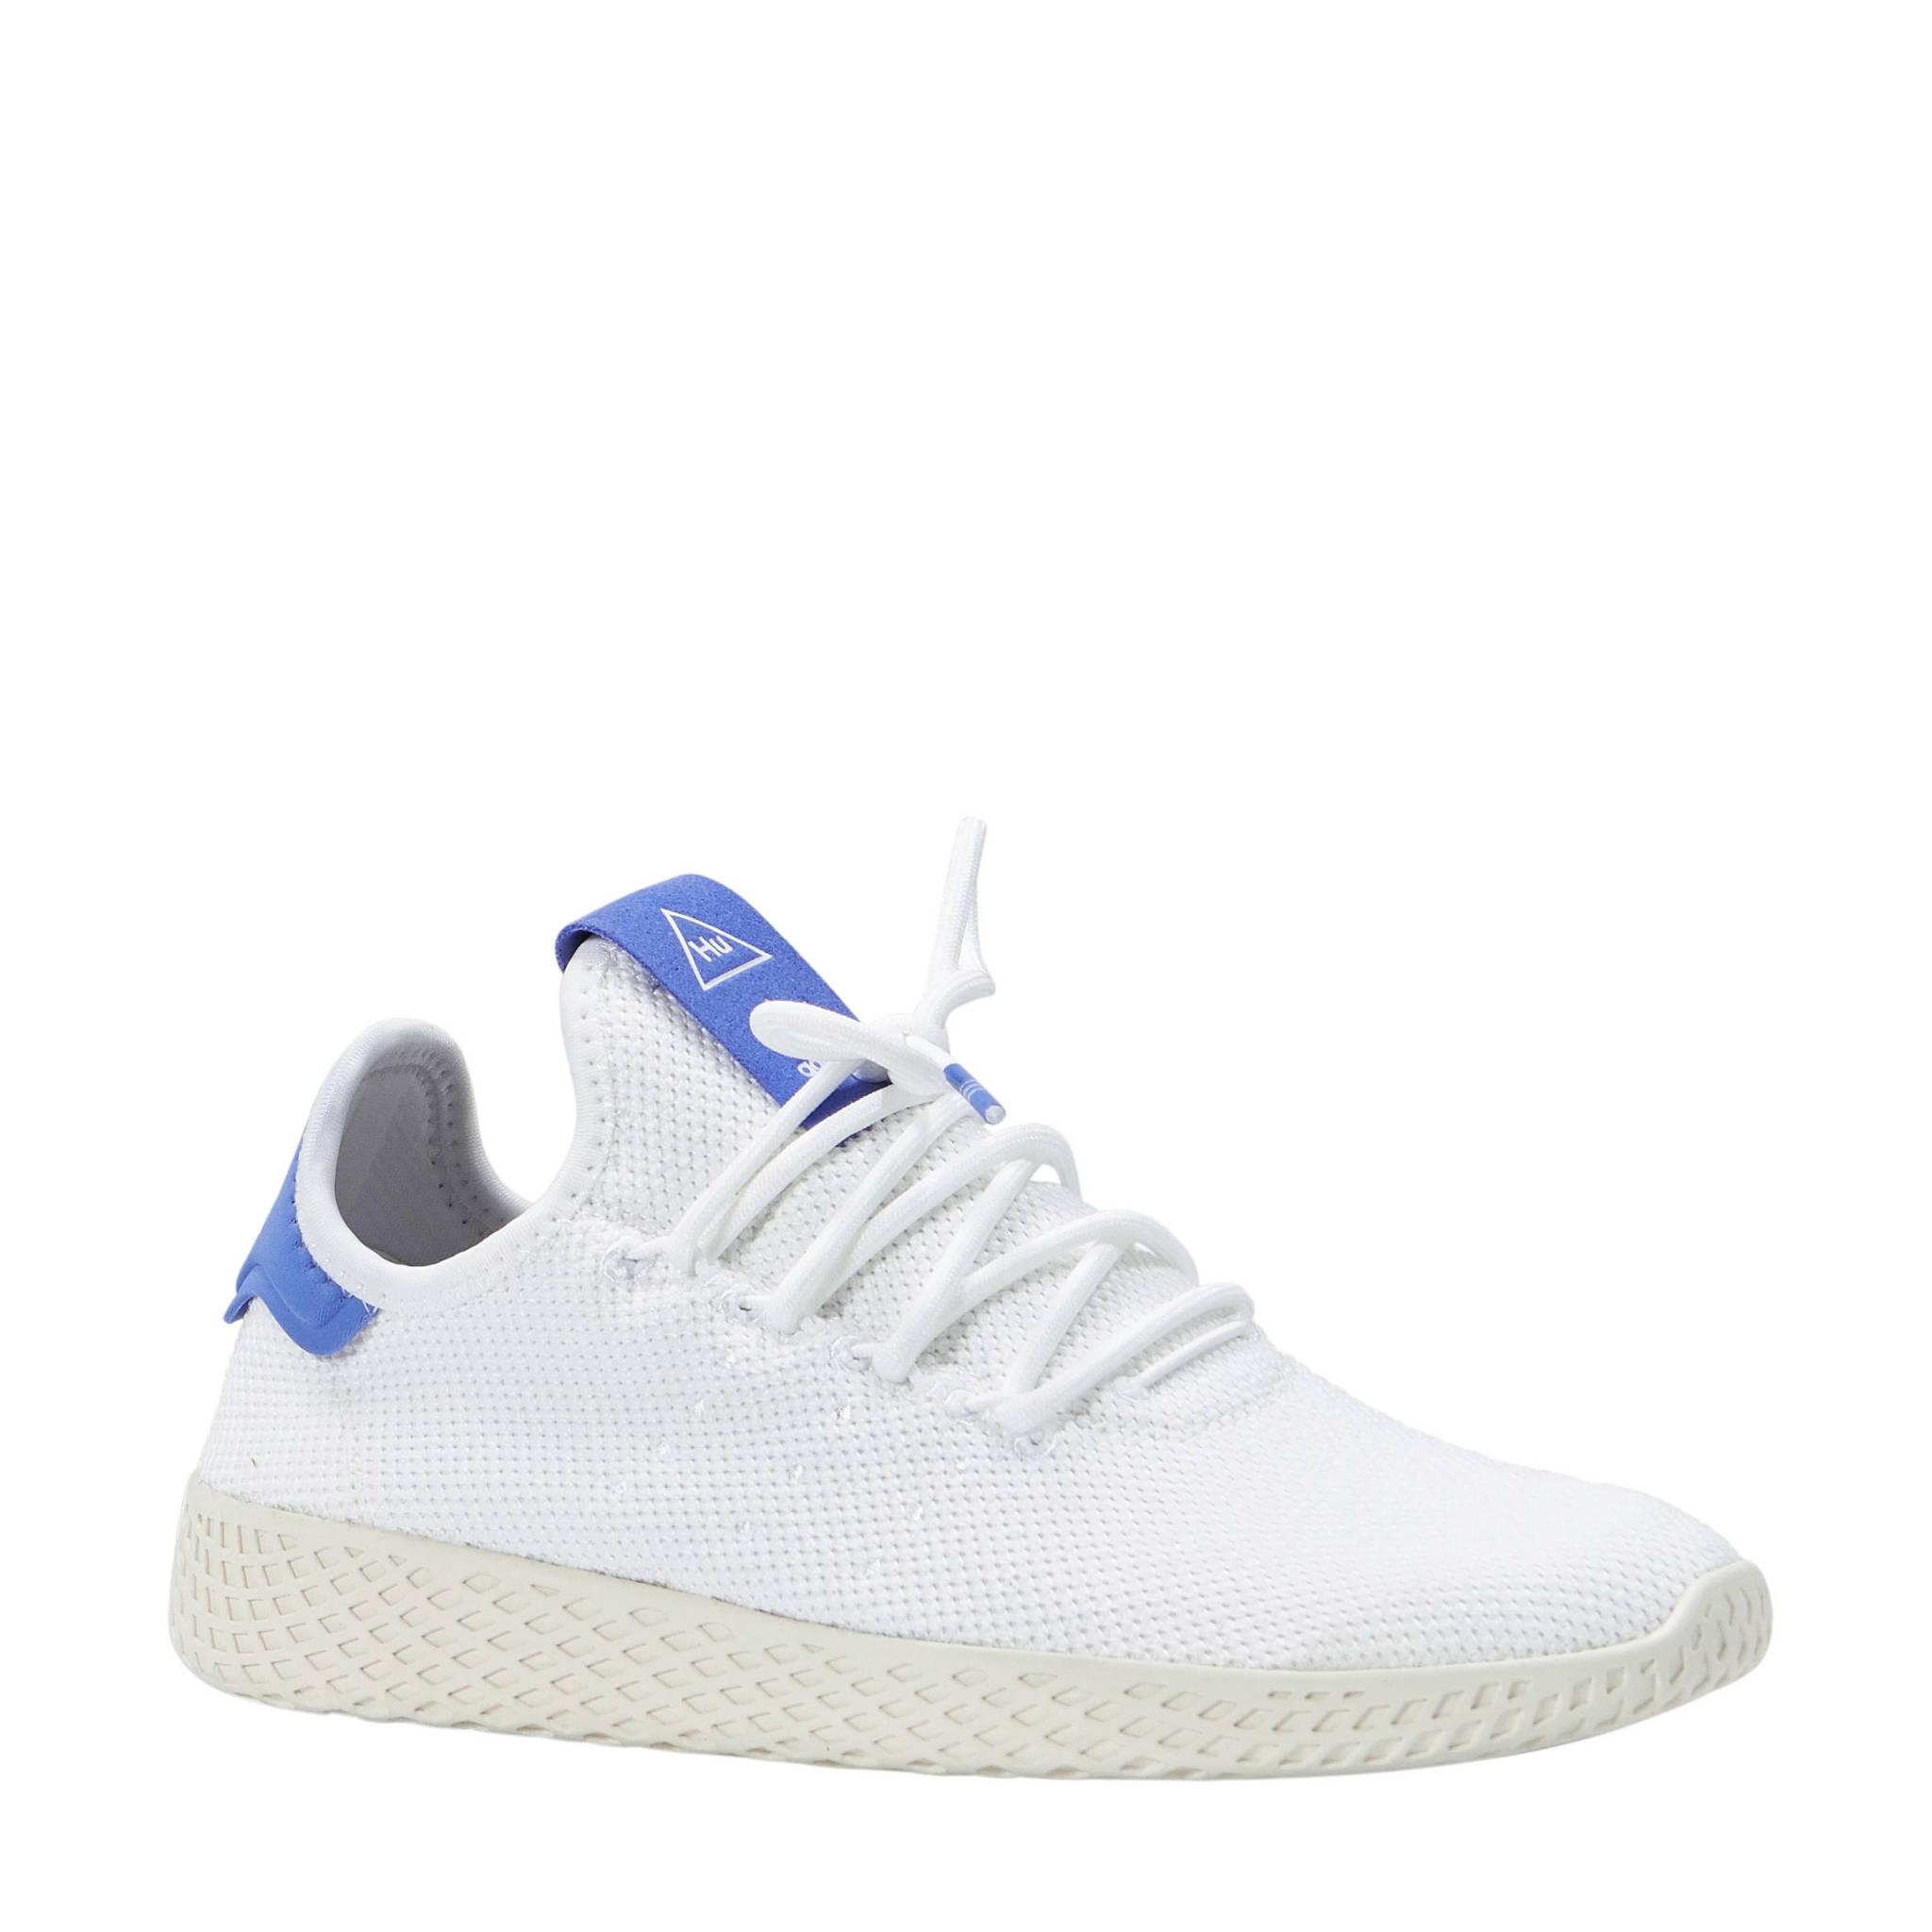 7b621a3cfd76ac adidas originals PW TENNIS HU sneakers